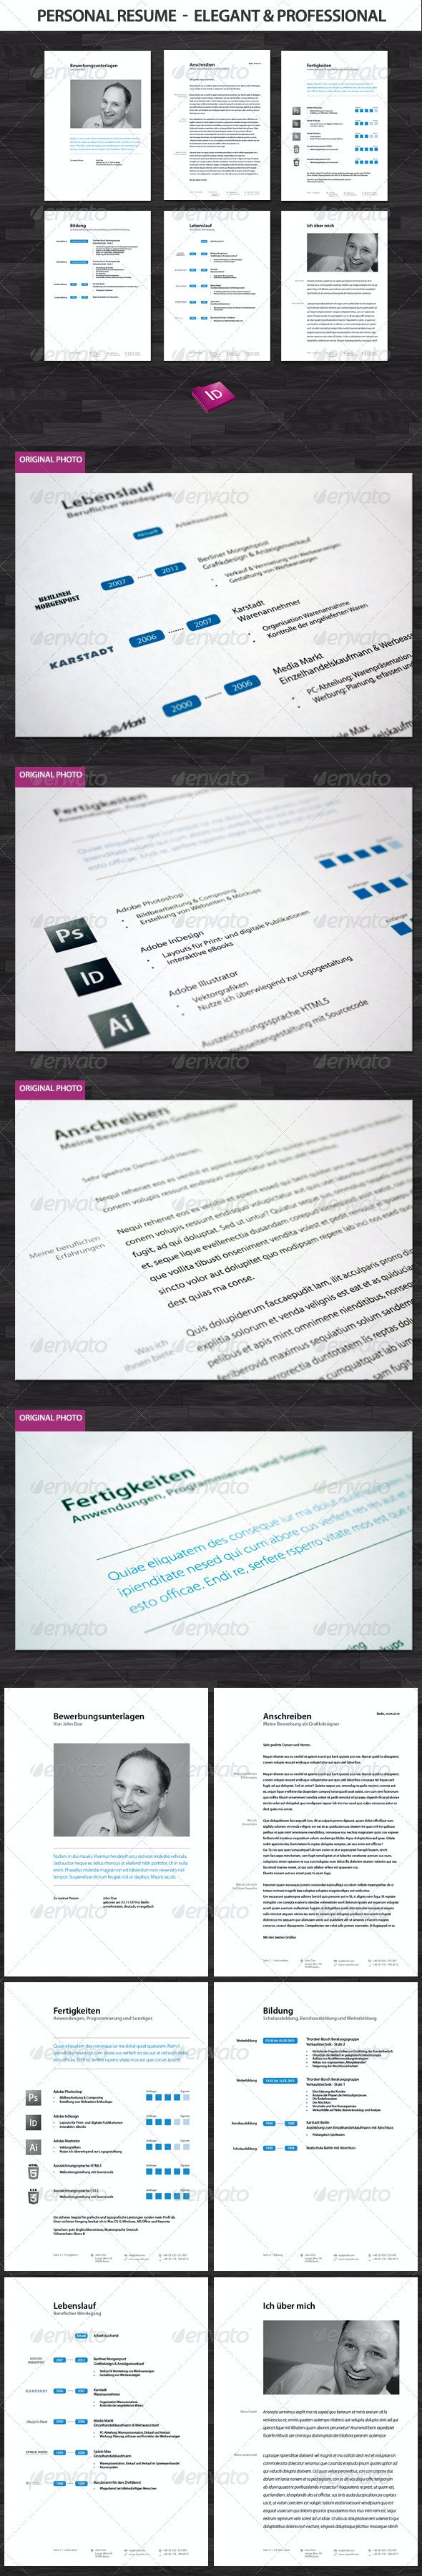 Professional and Elegant Resume Set  - Resumes Stationery